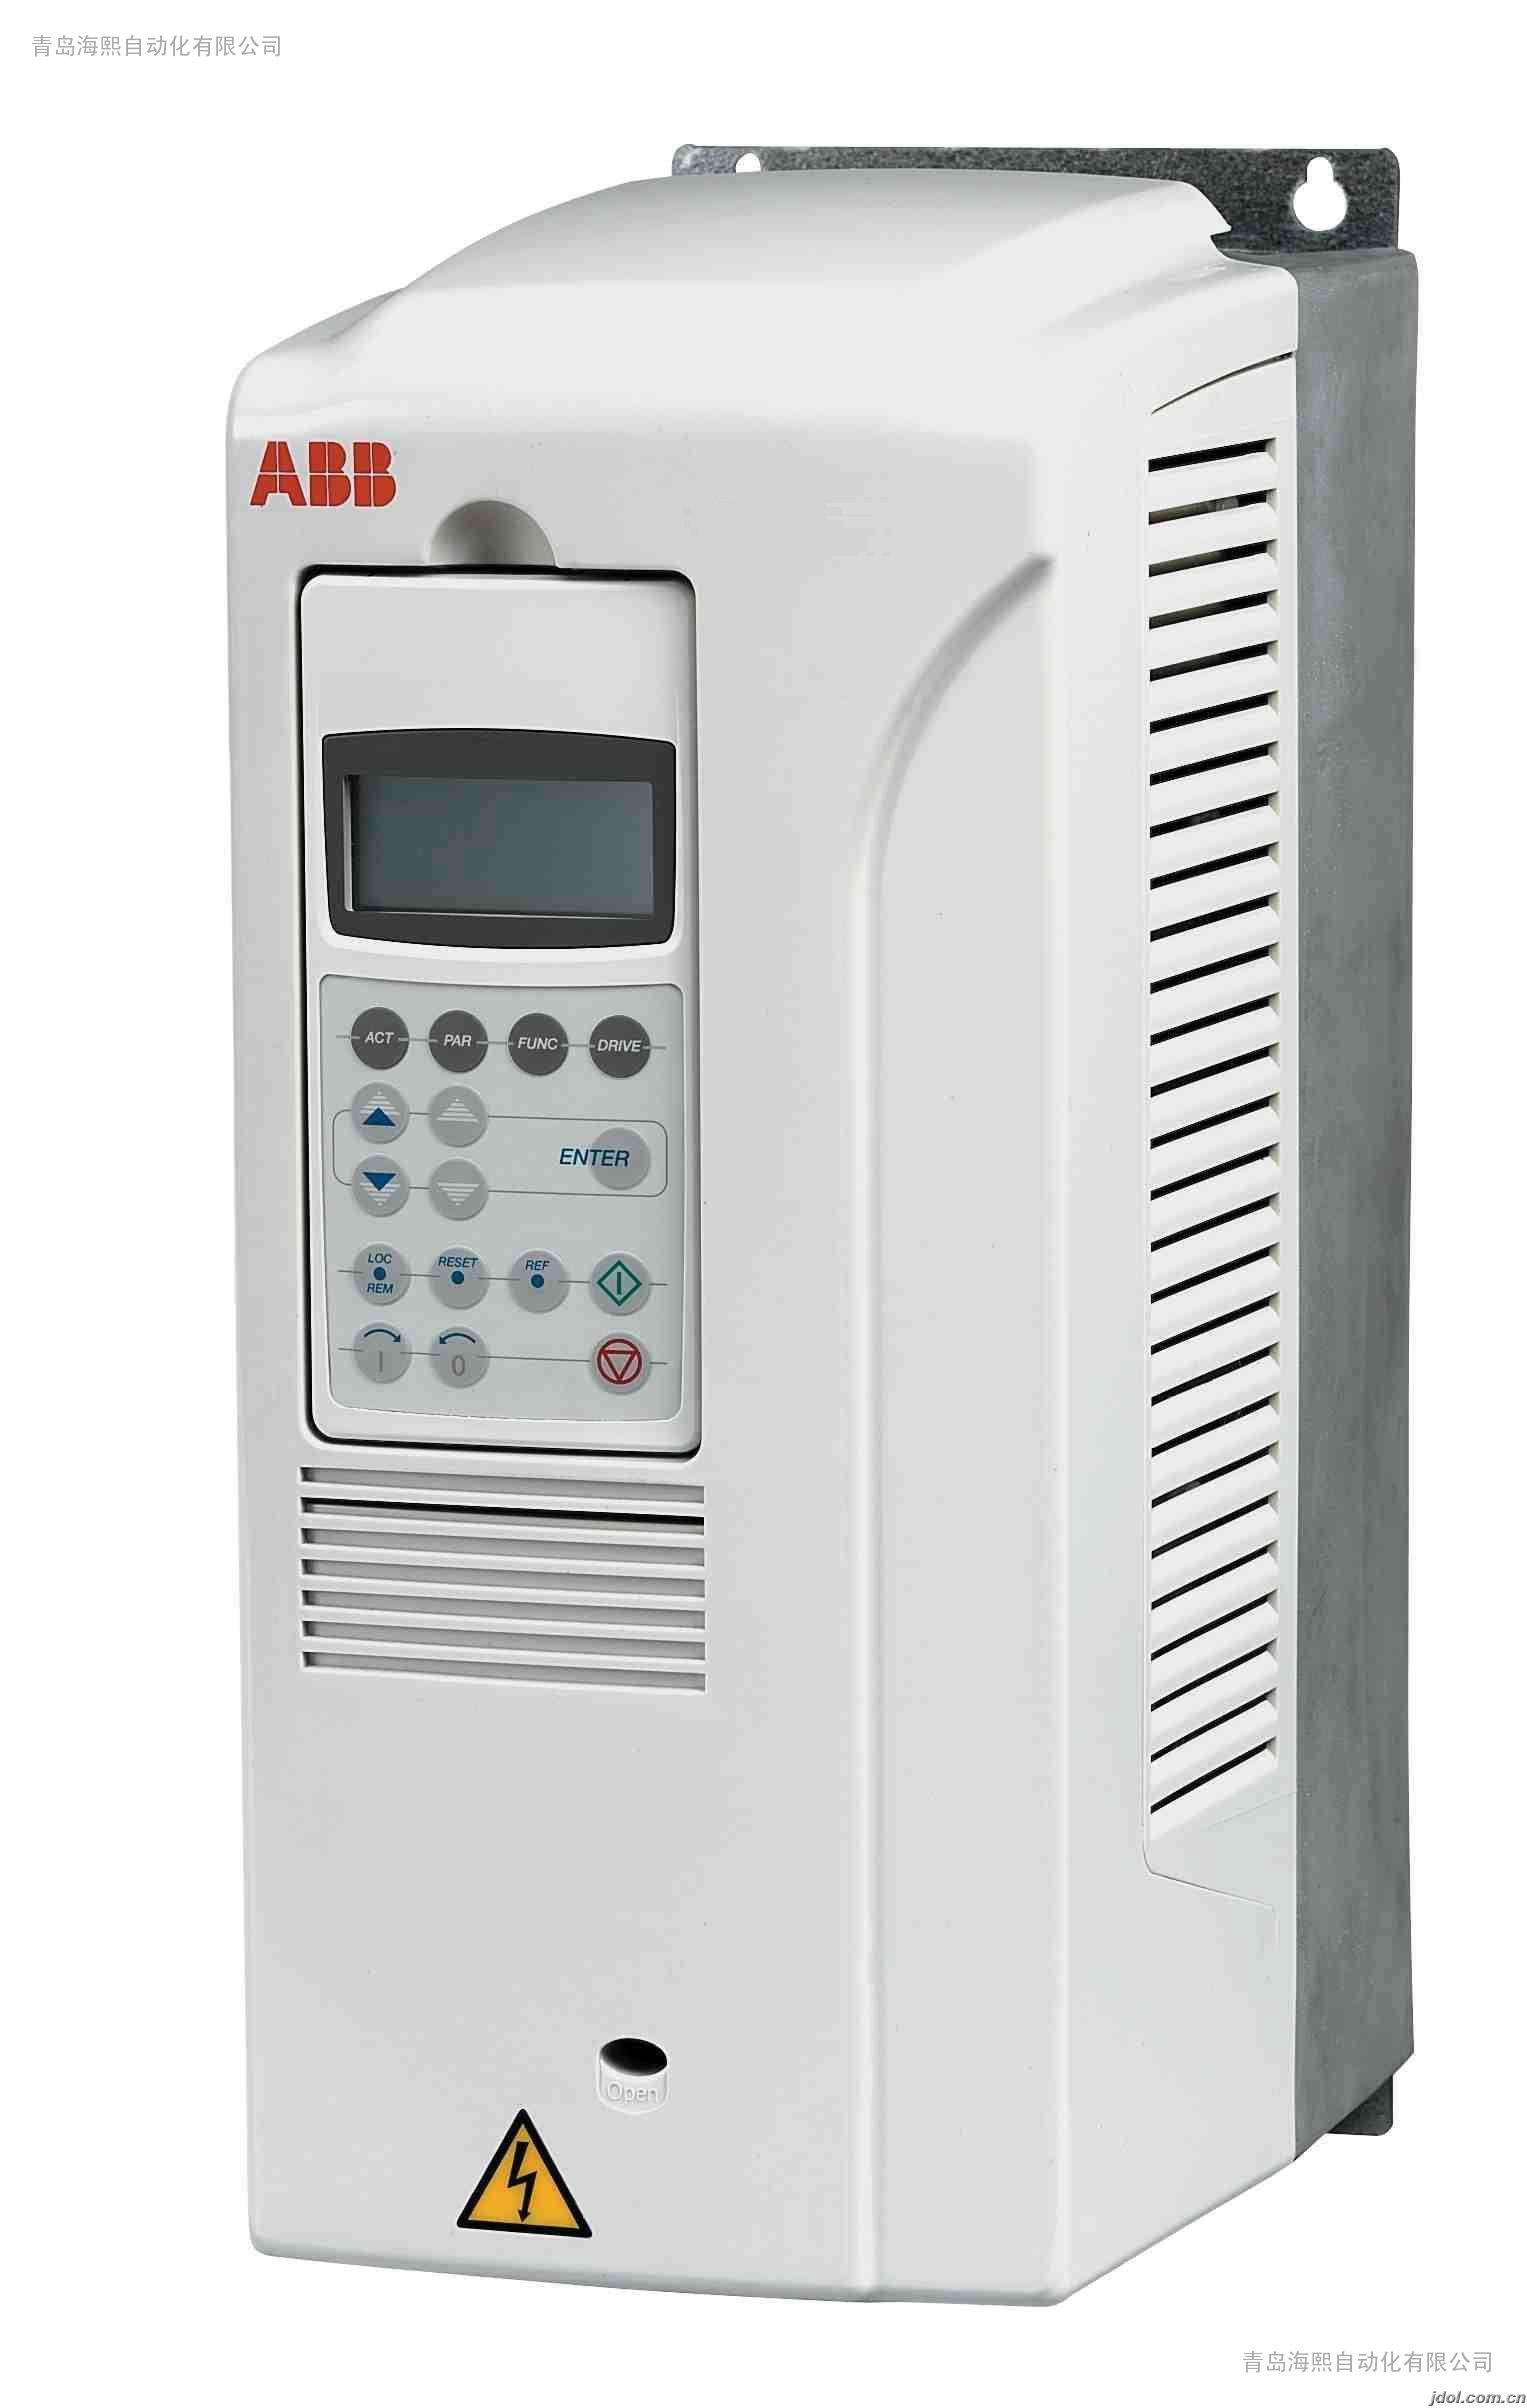 ABB青岛变频器